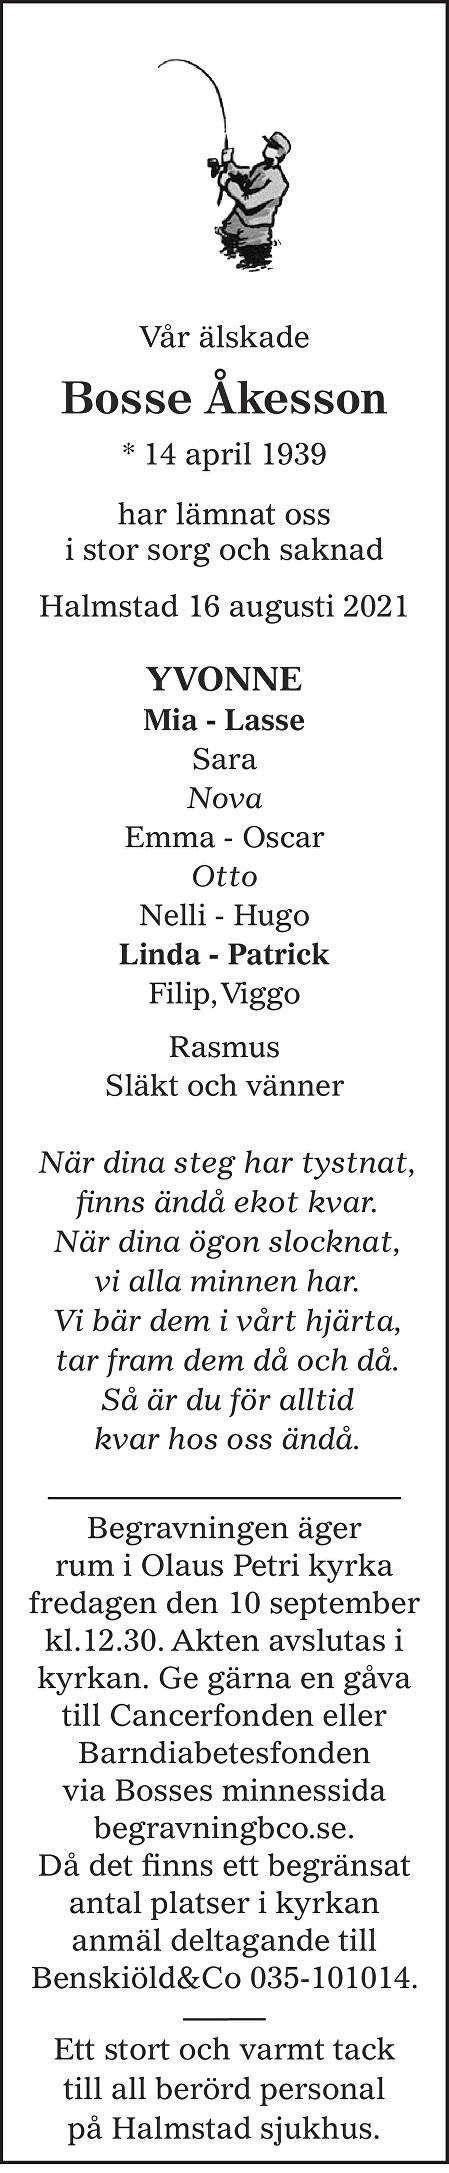 Bosse Åkesson Death notice